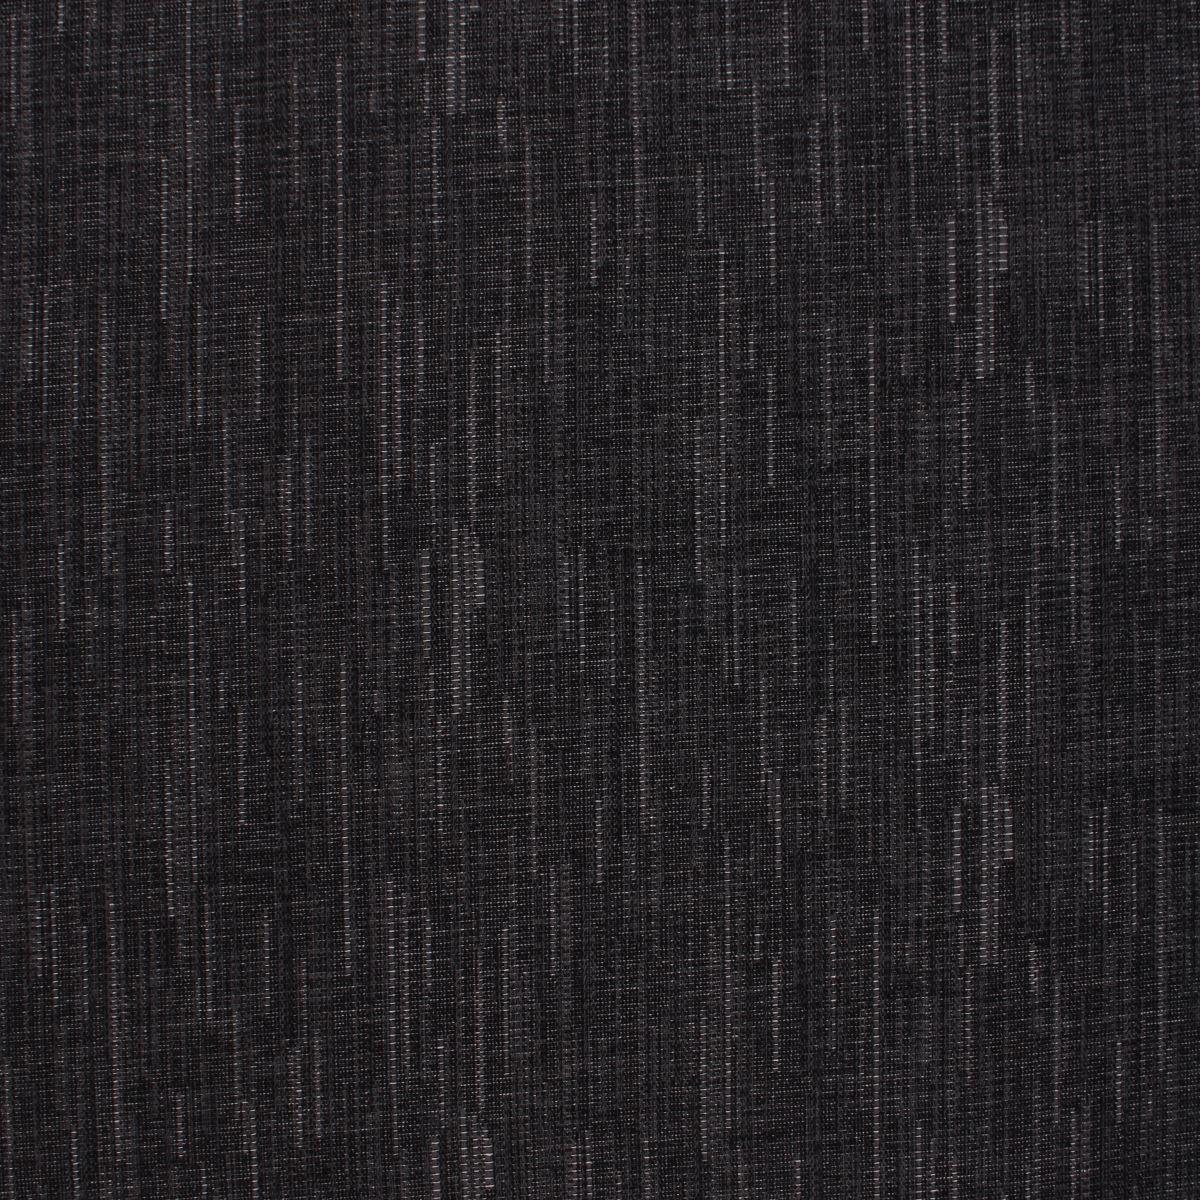 034-Chenille-034-Slubbed-Shabby-Worn-Look-Curtain-Cushion-Sofa-Upholstery-Fabric thumbnail 8